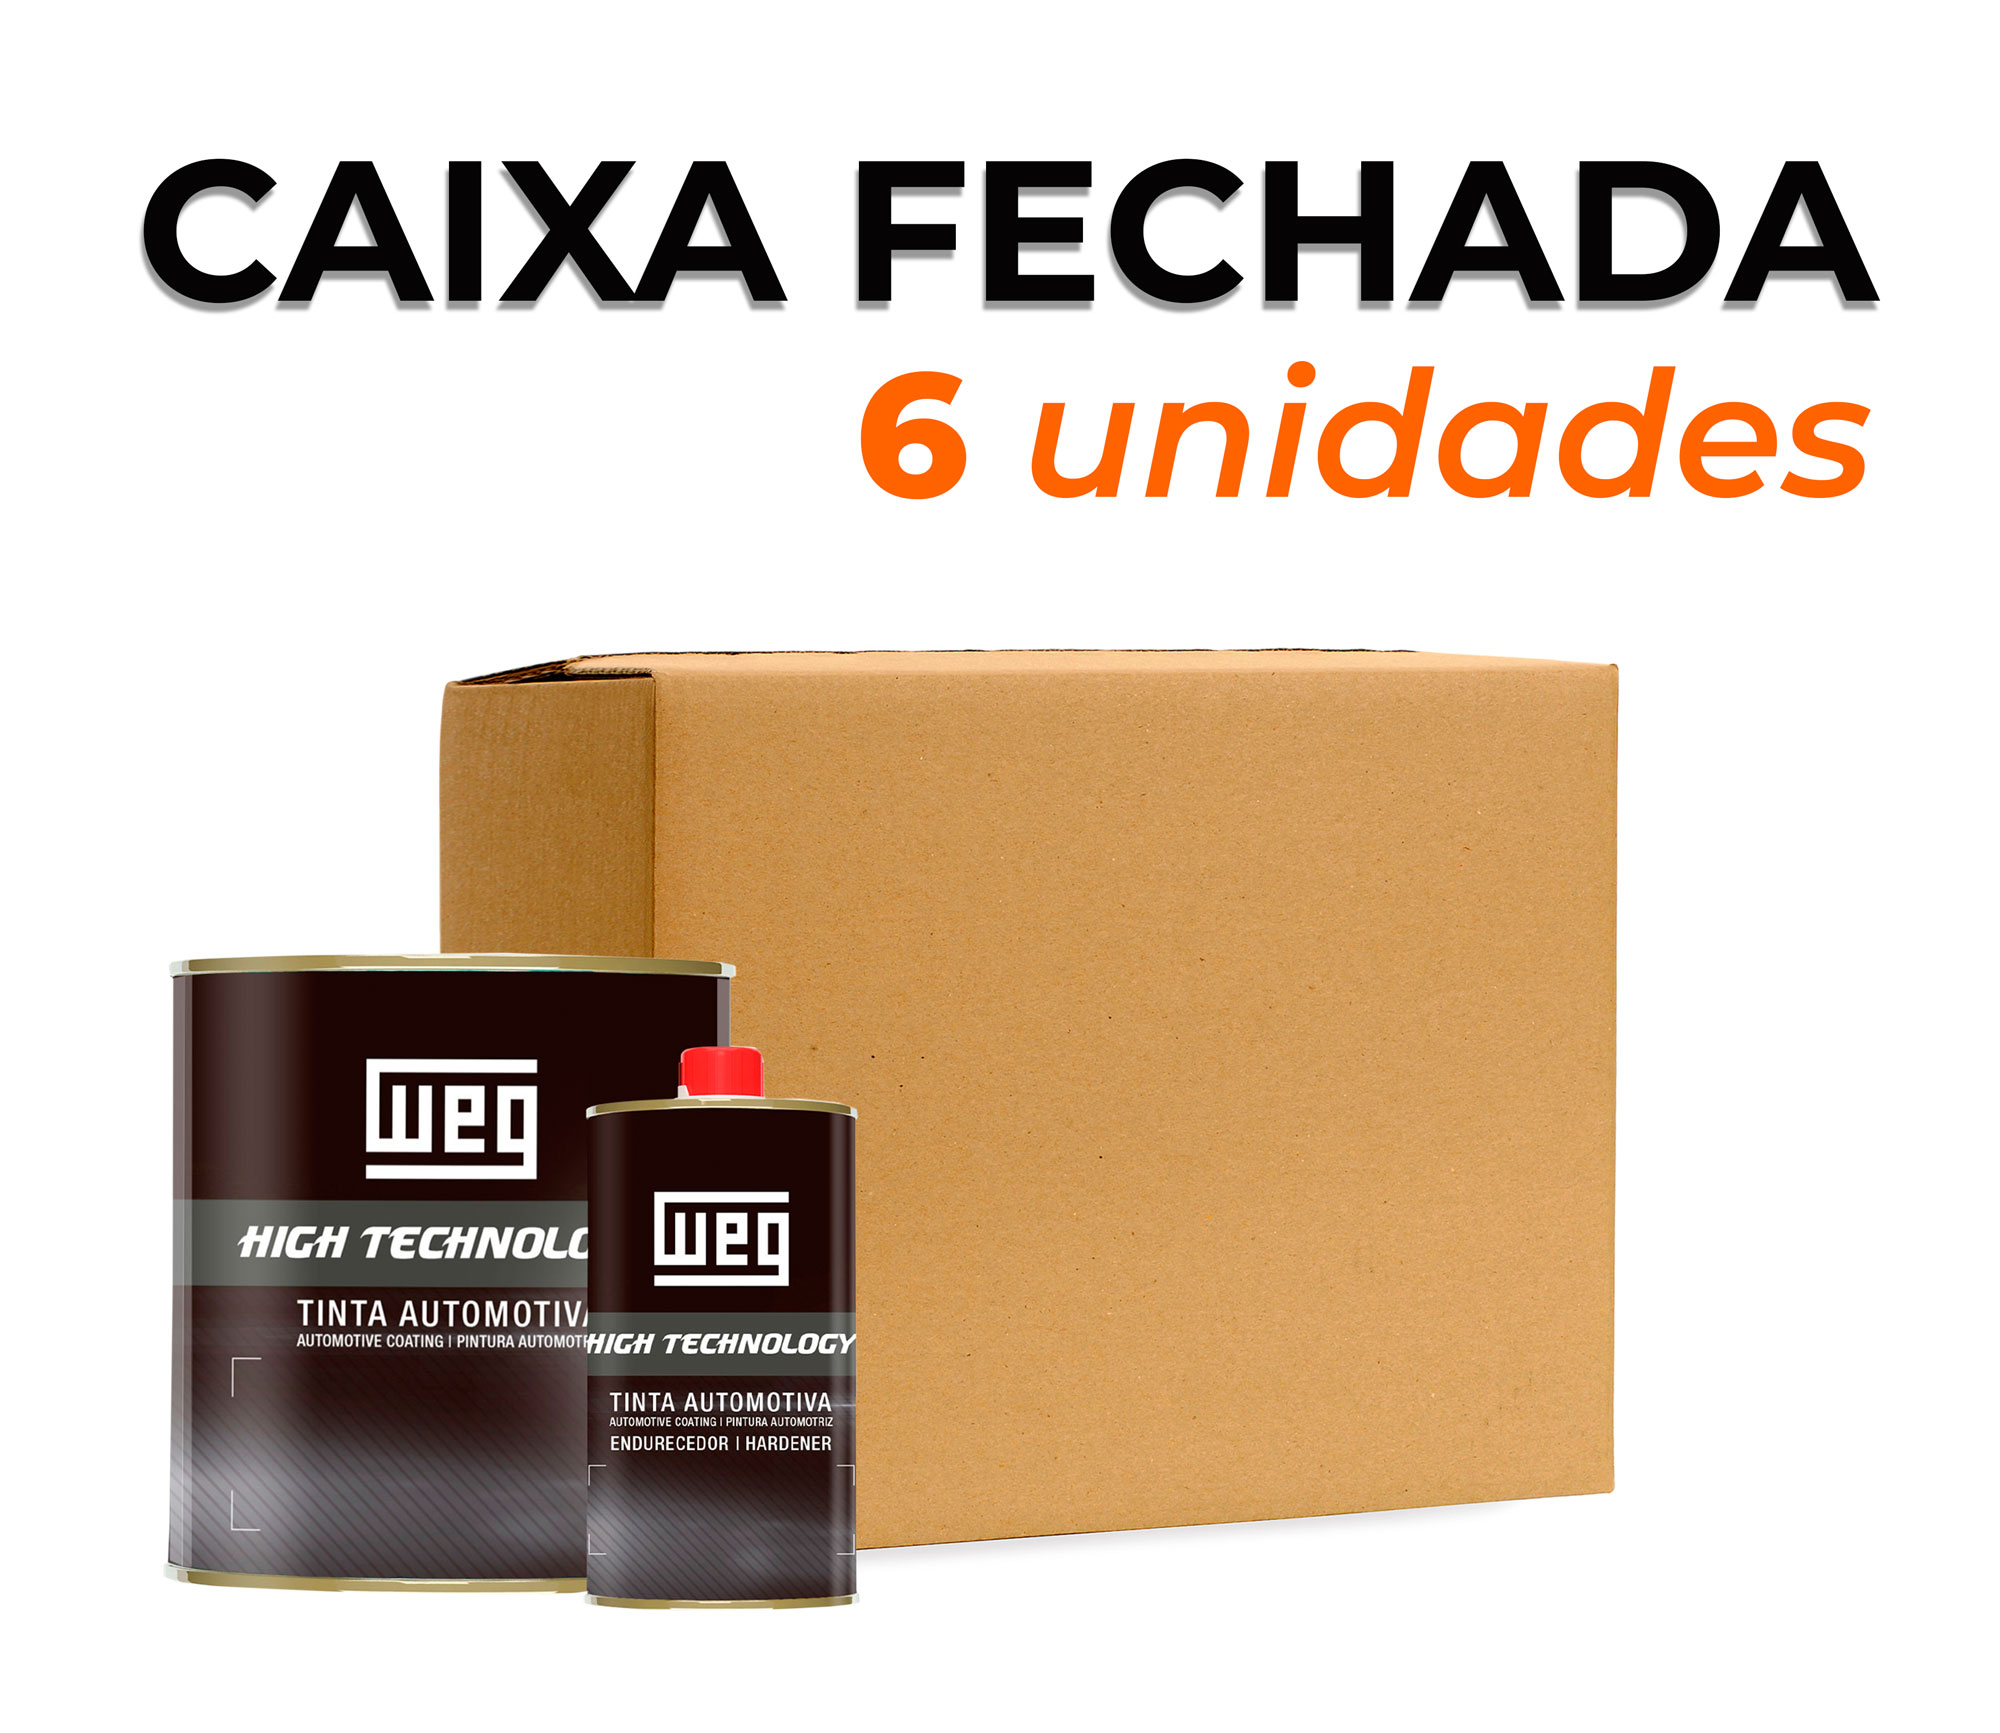 CAIXA VERNIZ ALTO SÓLIDO W30 900 ml + CATALISADOR BAIXA TEMPERATURA 450 ml